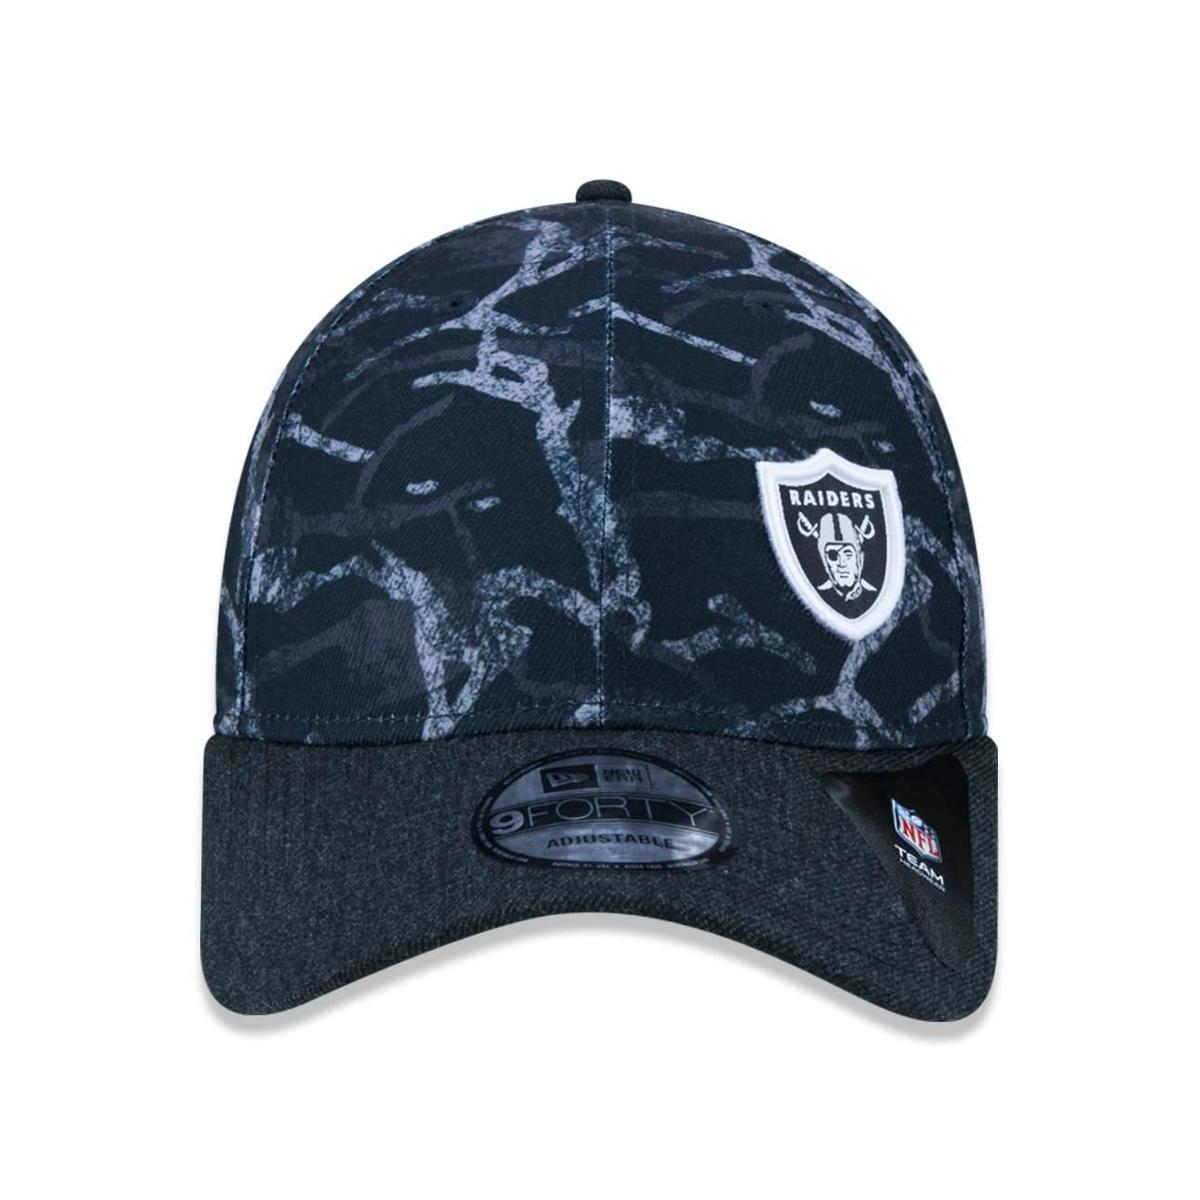 15bf4b936b028 Boné 940 Oakland Raiders NFL Aba Curva Snapback New Era - Preto ...